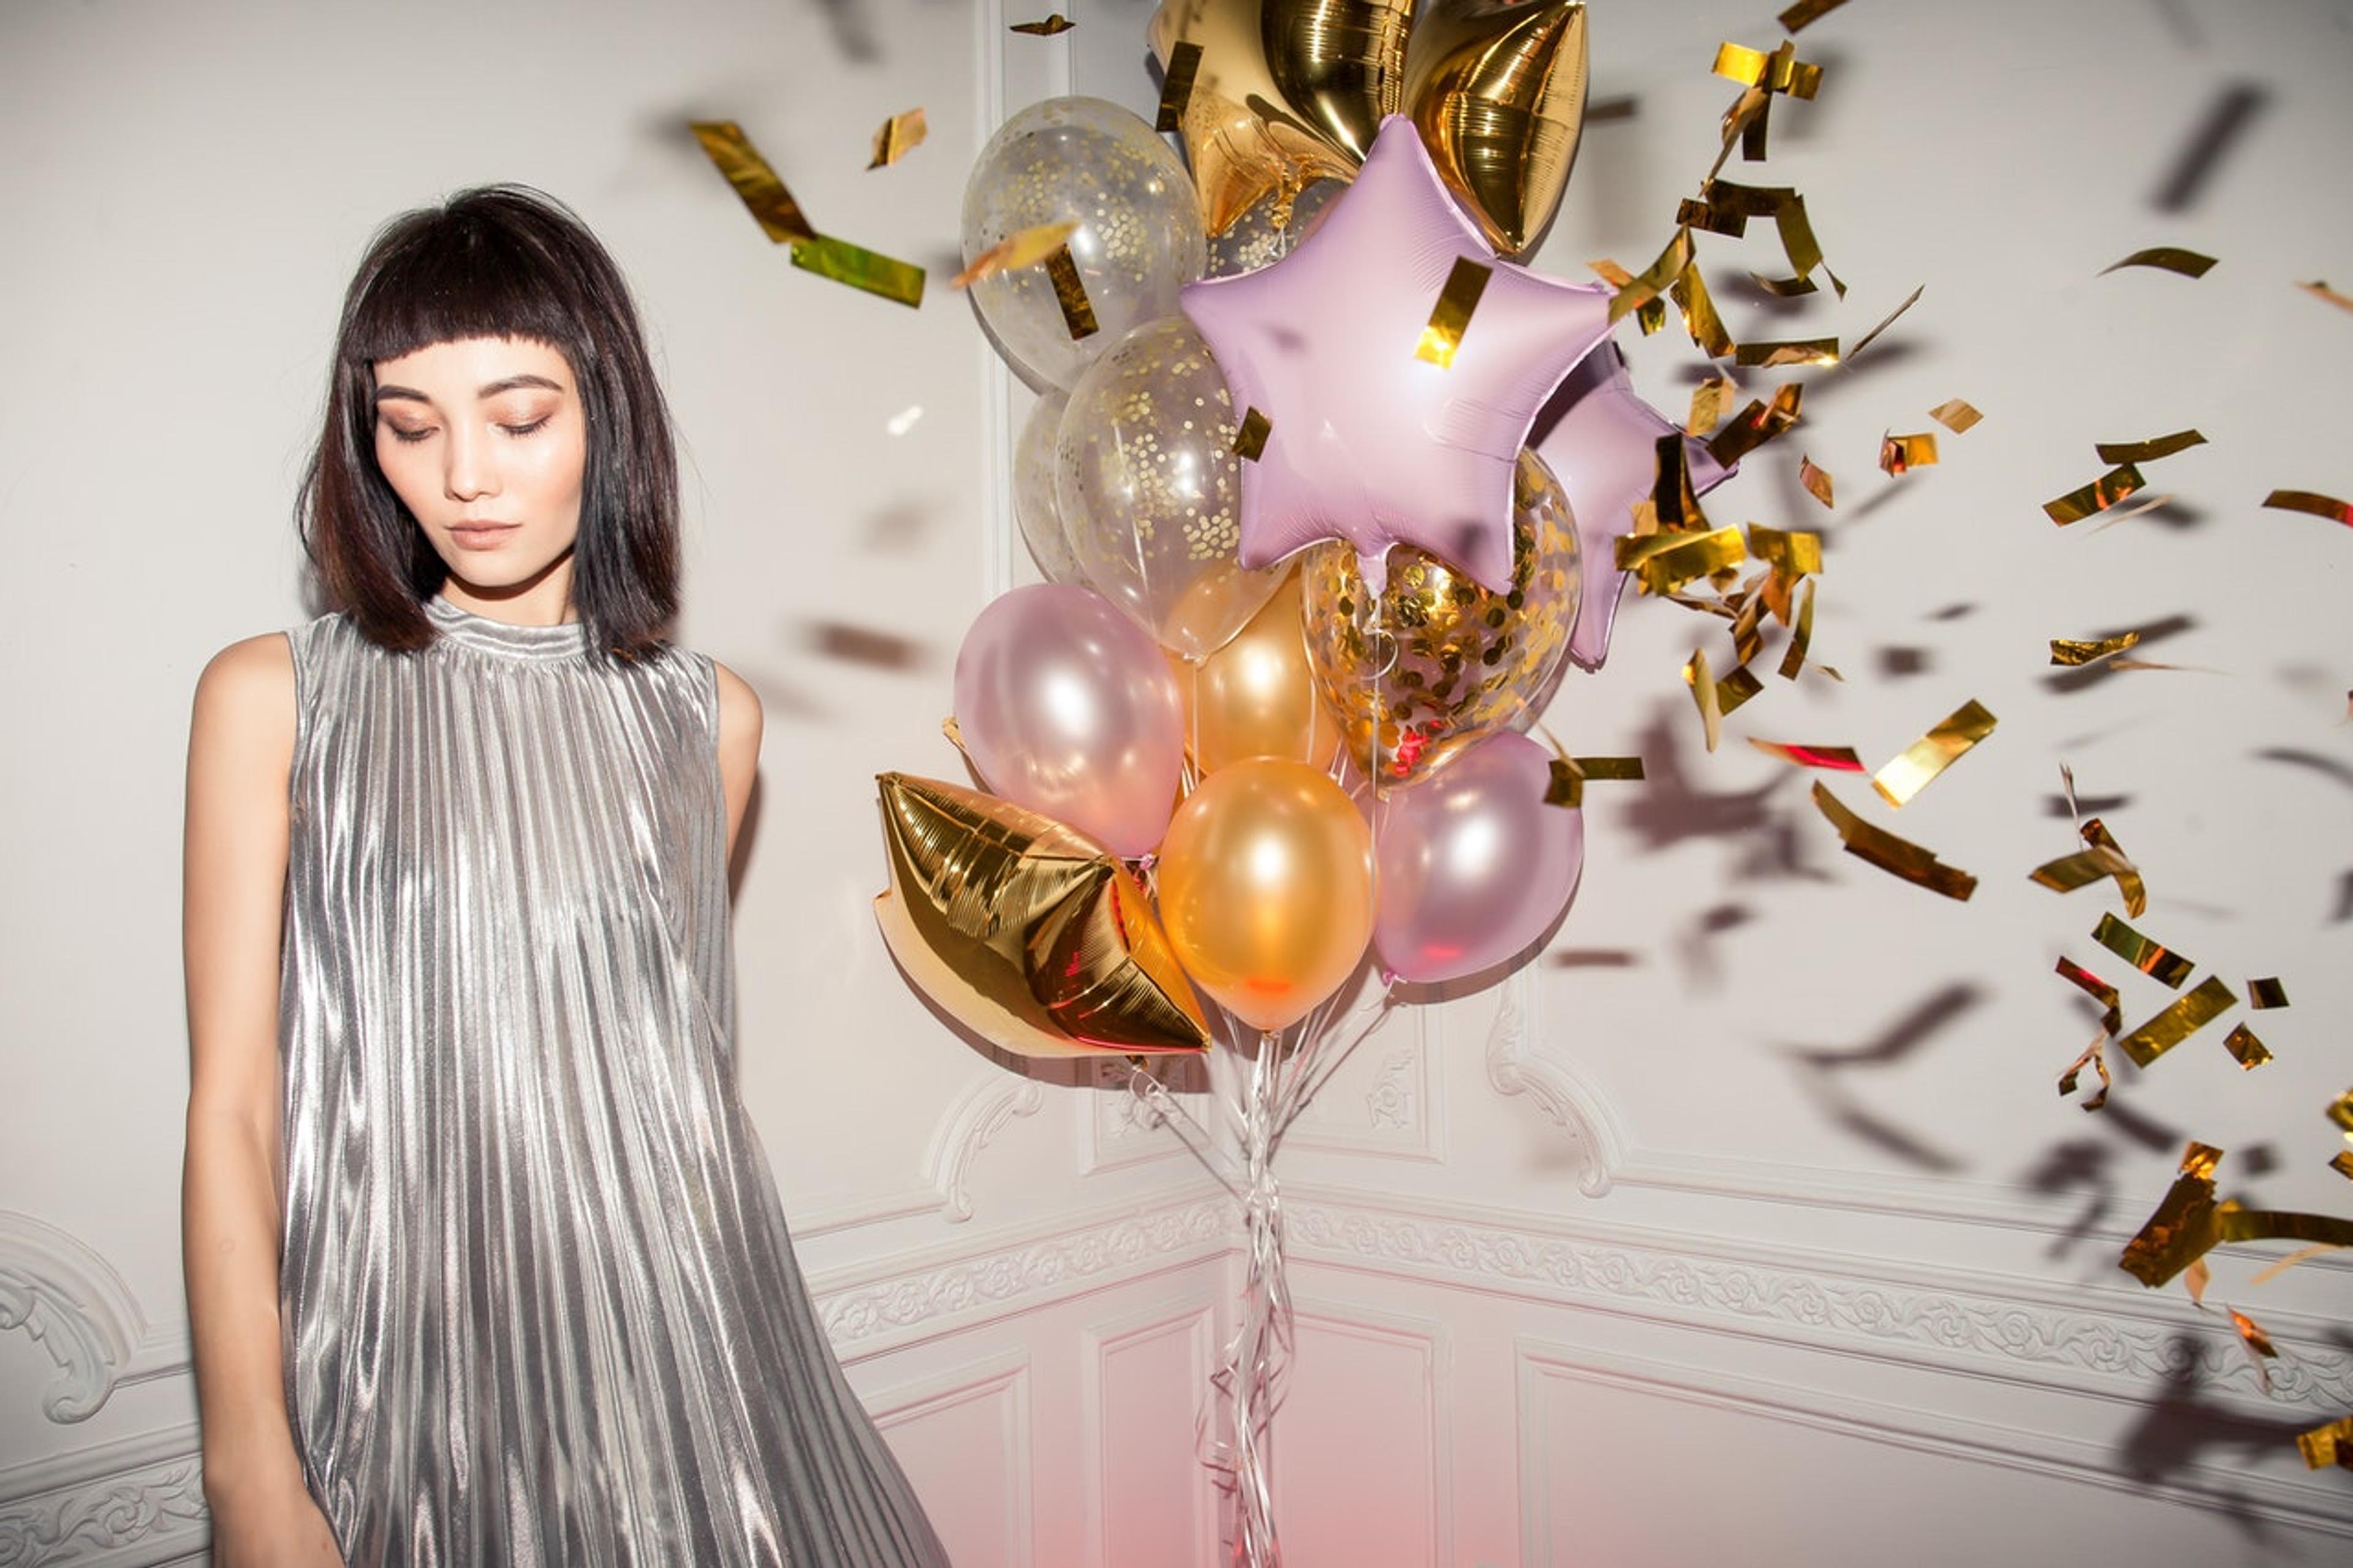 Model posing in front of birthday balloons